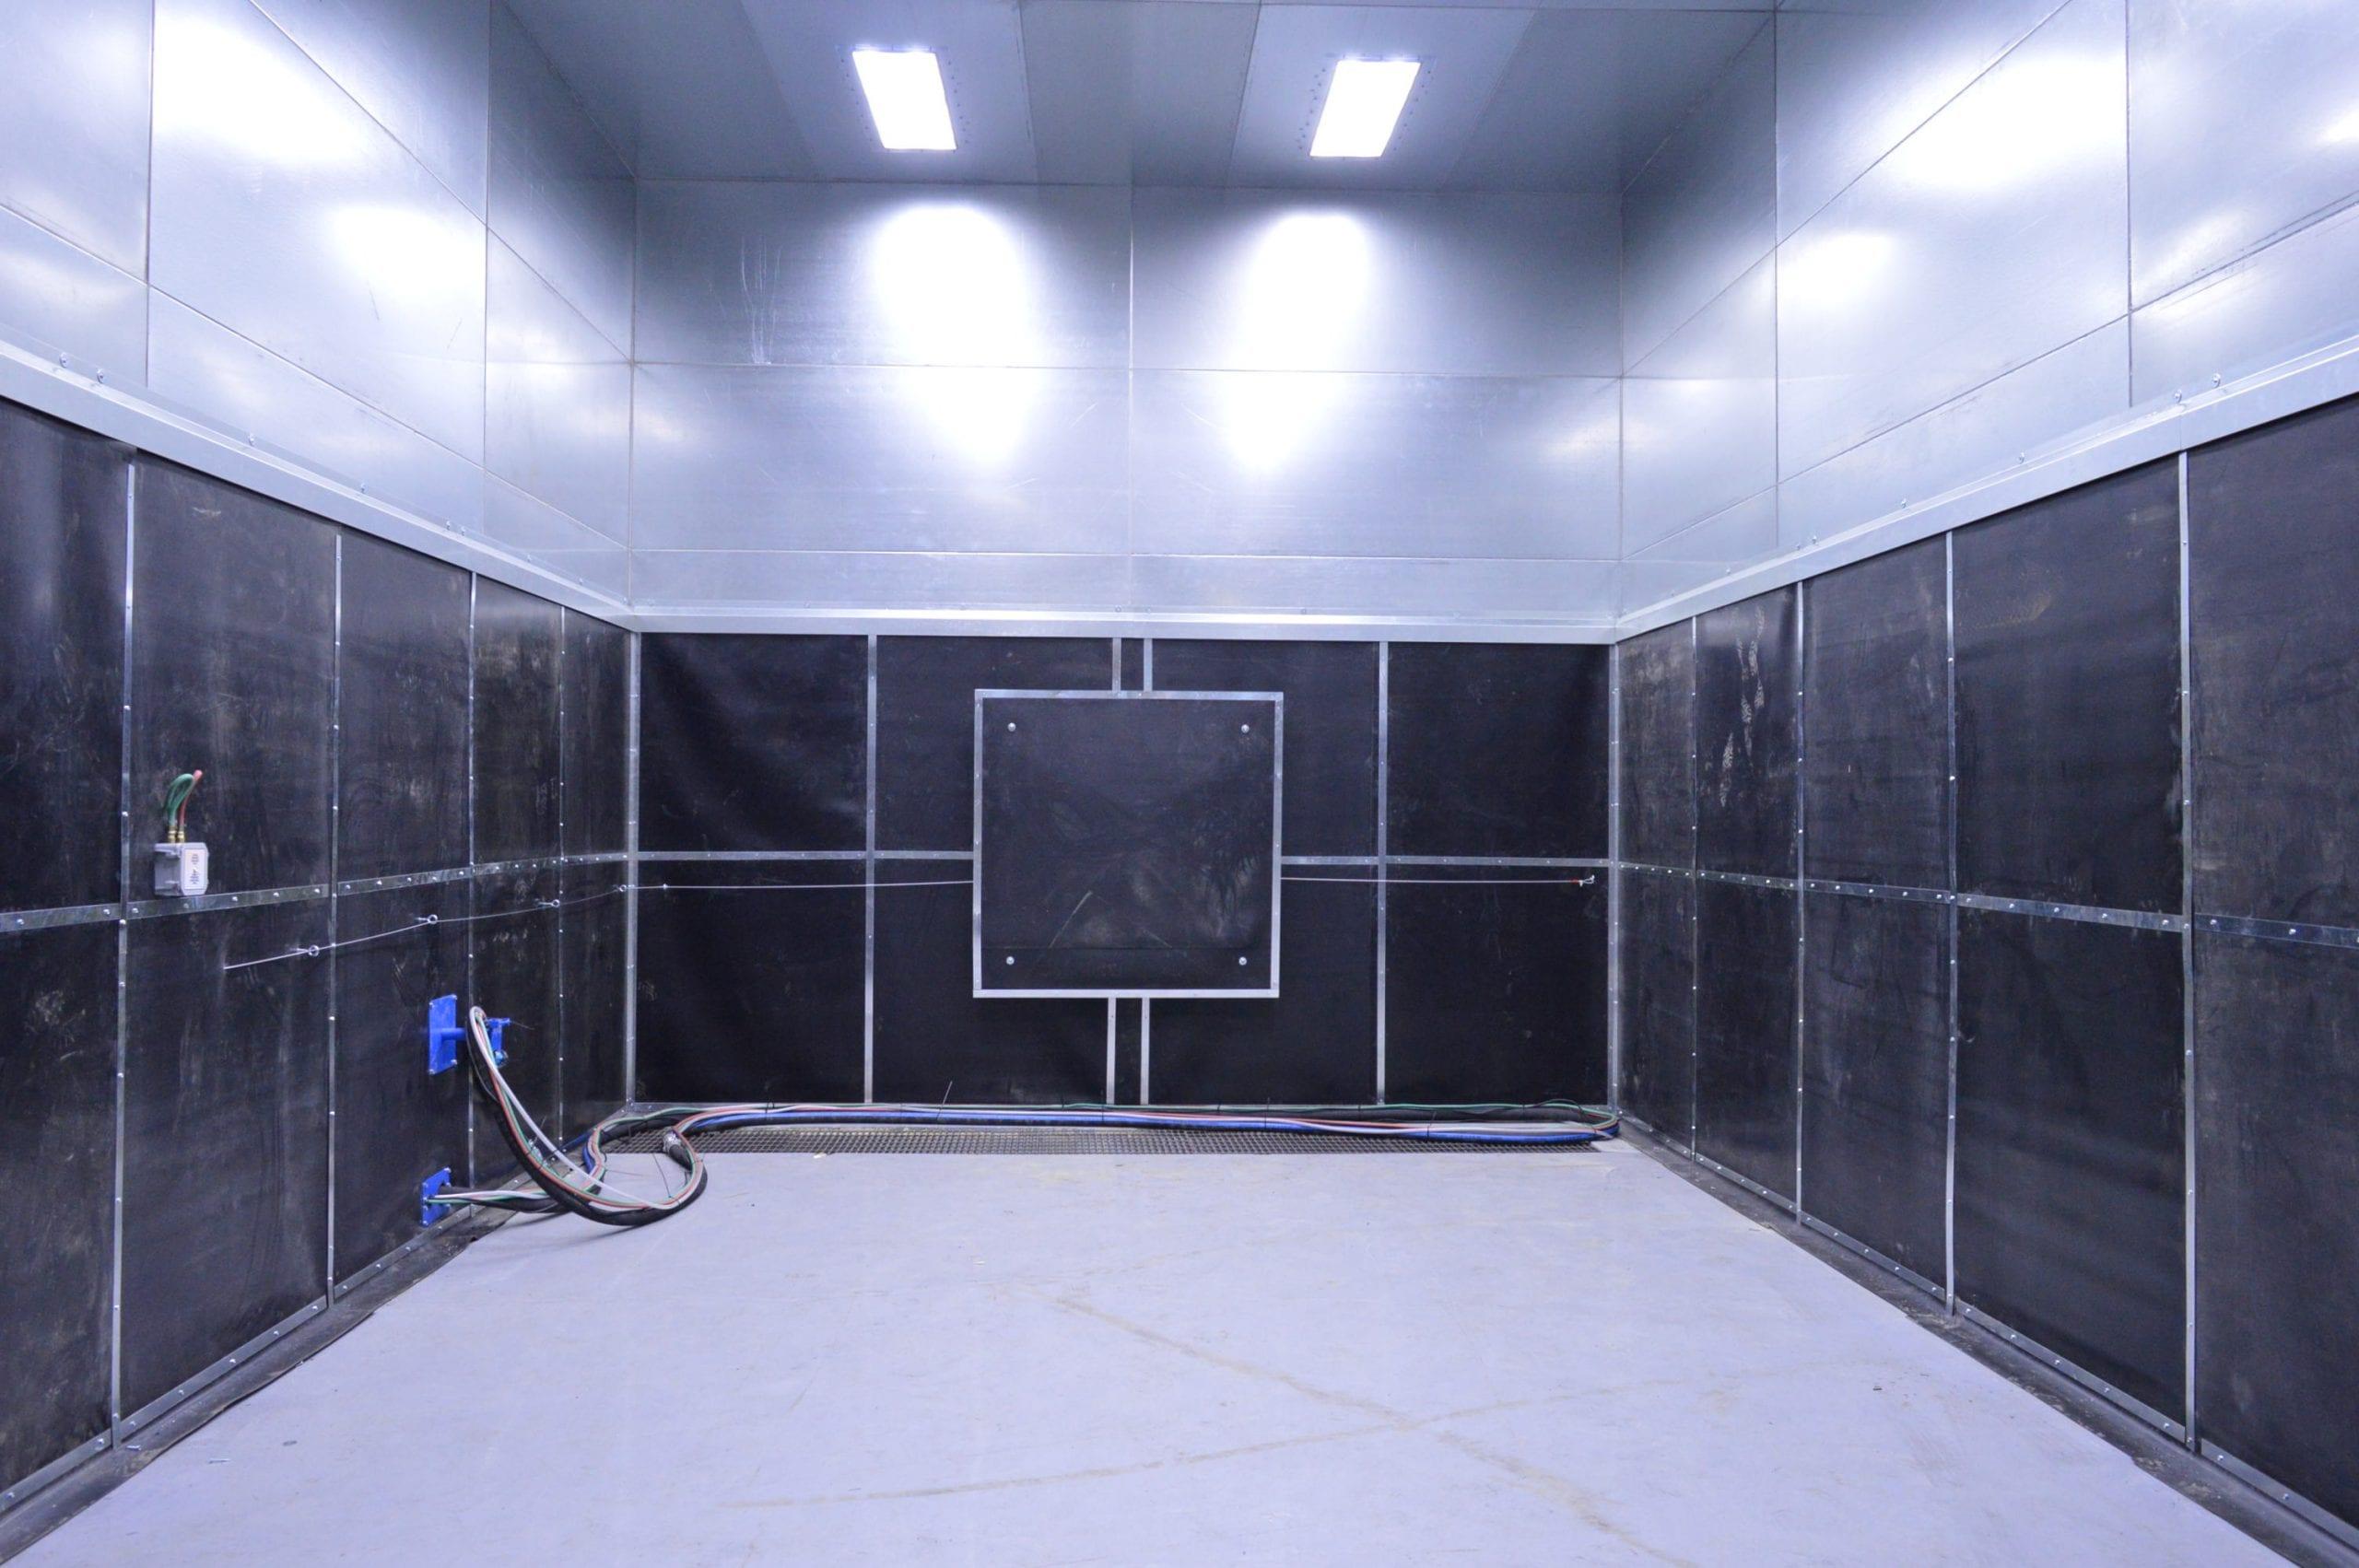 Sandblast Room with Rubber Lining Inside Wall Panels